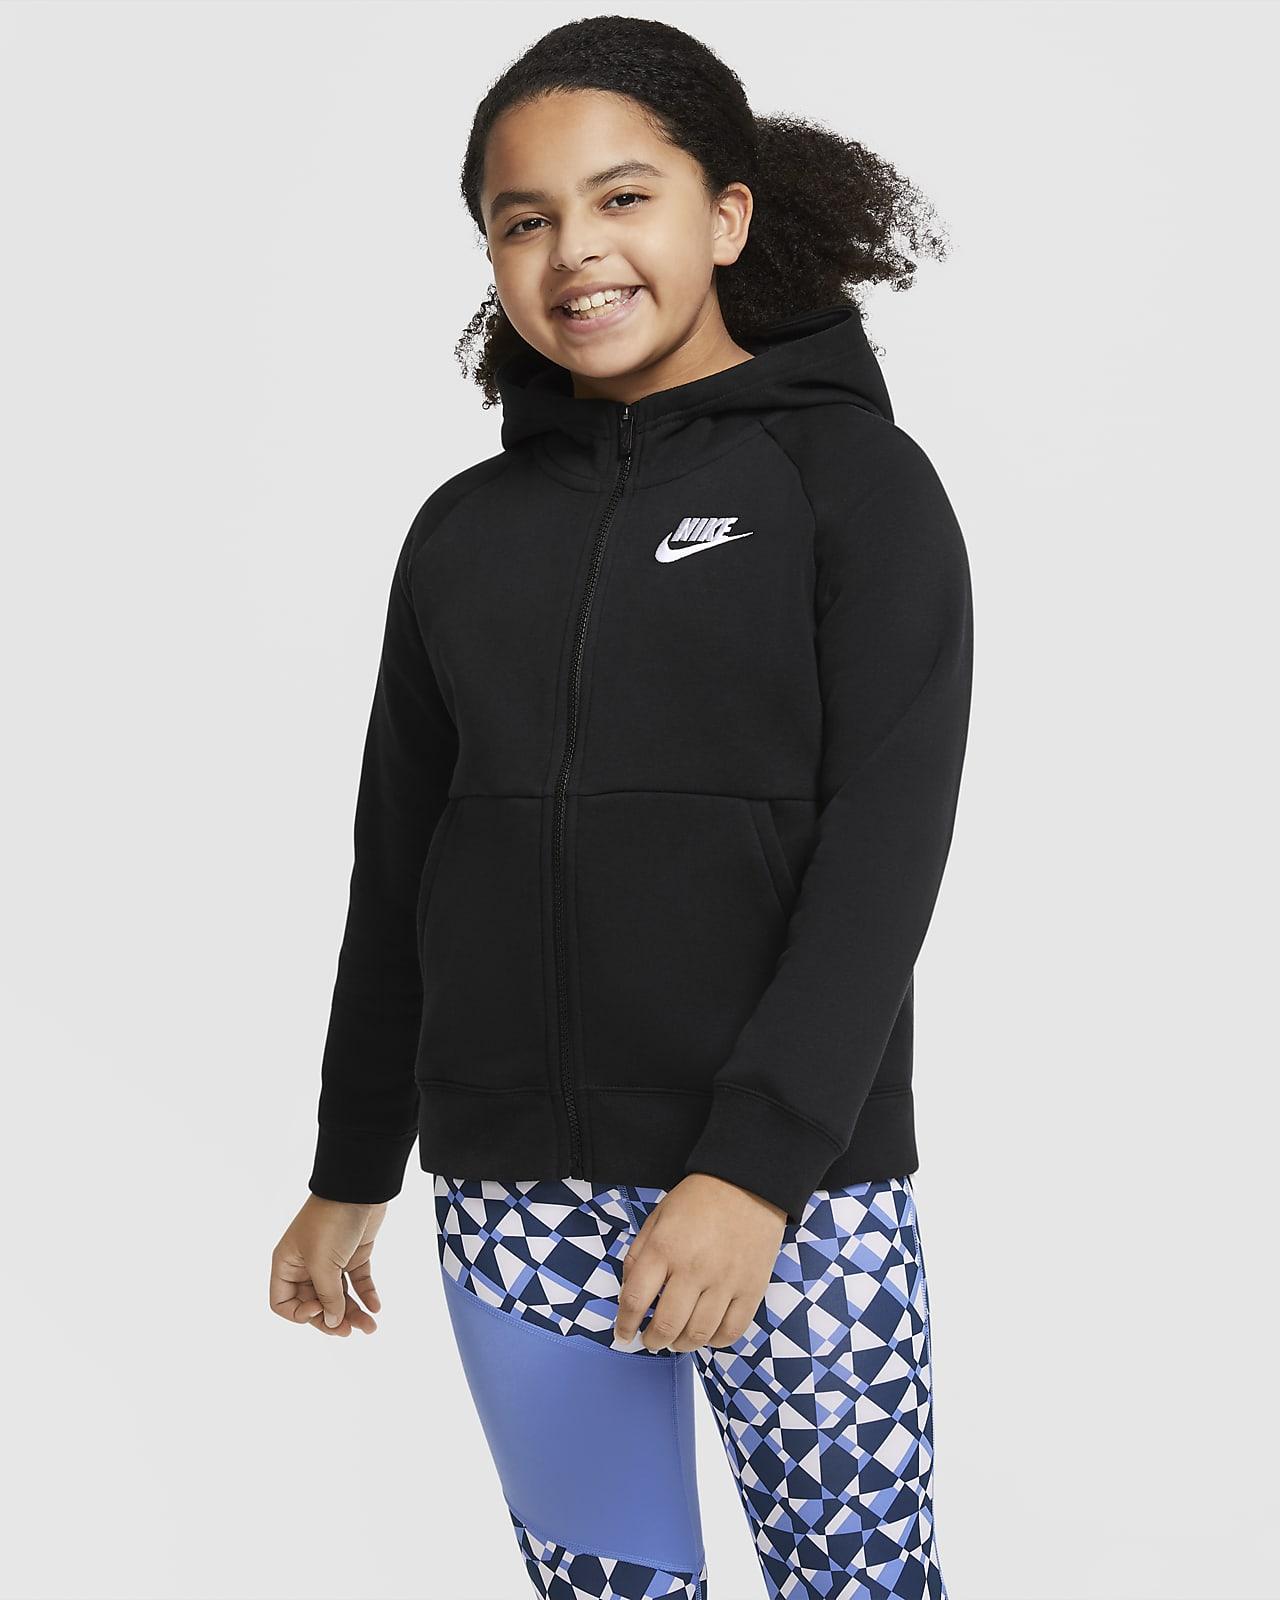 Nike Sportswear Big Kids' (Girls') Full-Zip Hoodie (Extended Size)